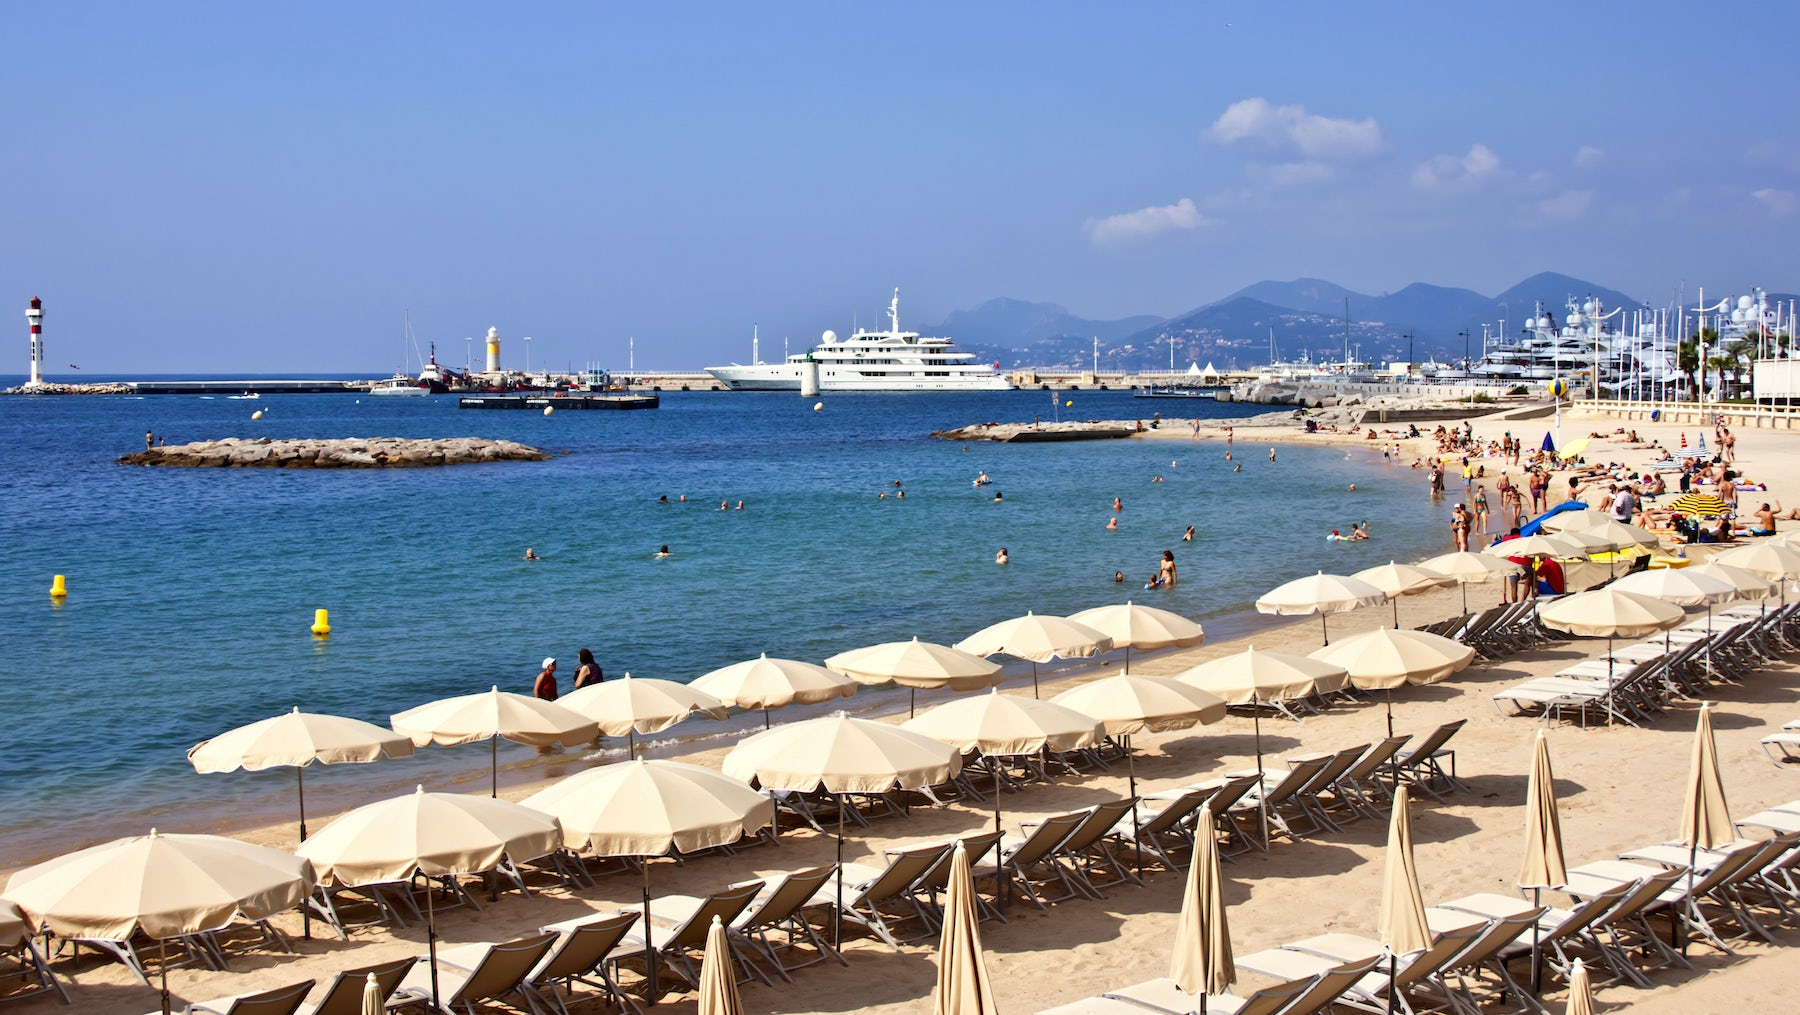 Cannes beach   Source: Shutterstock